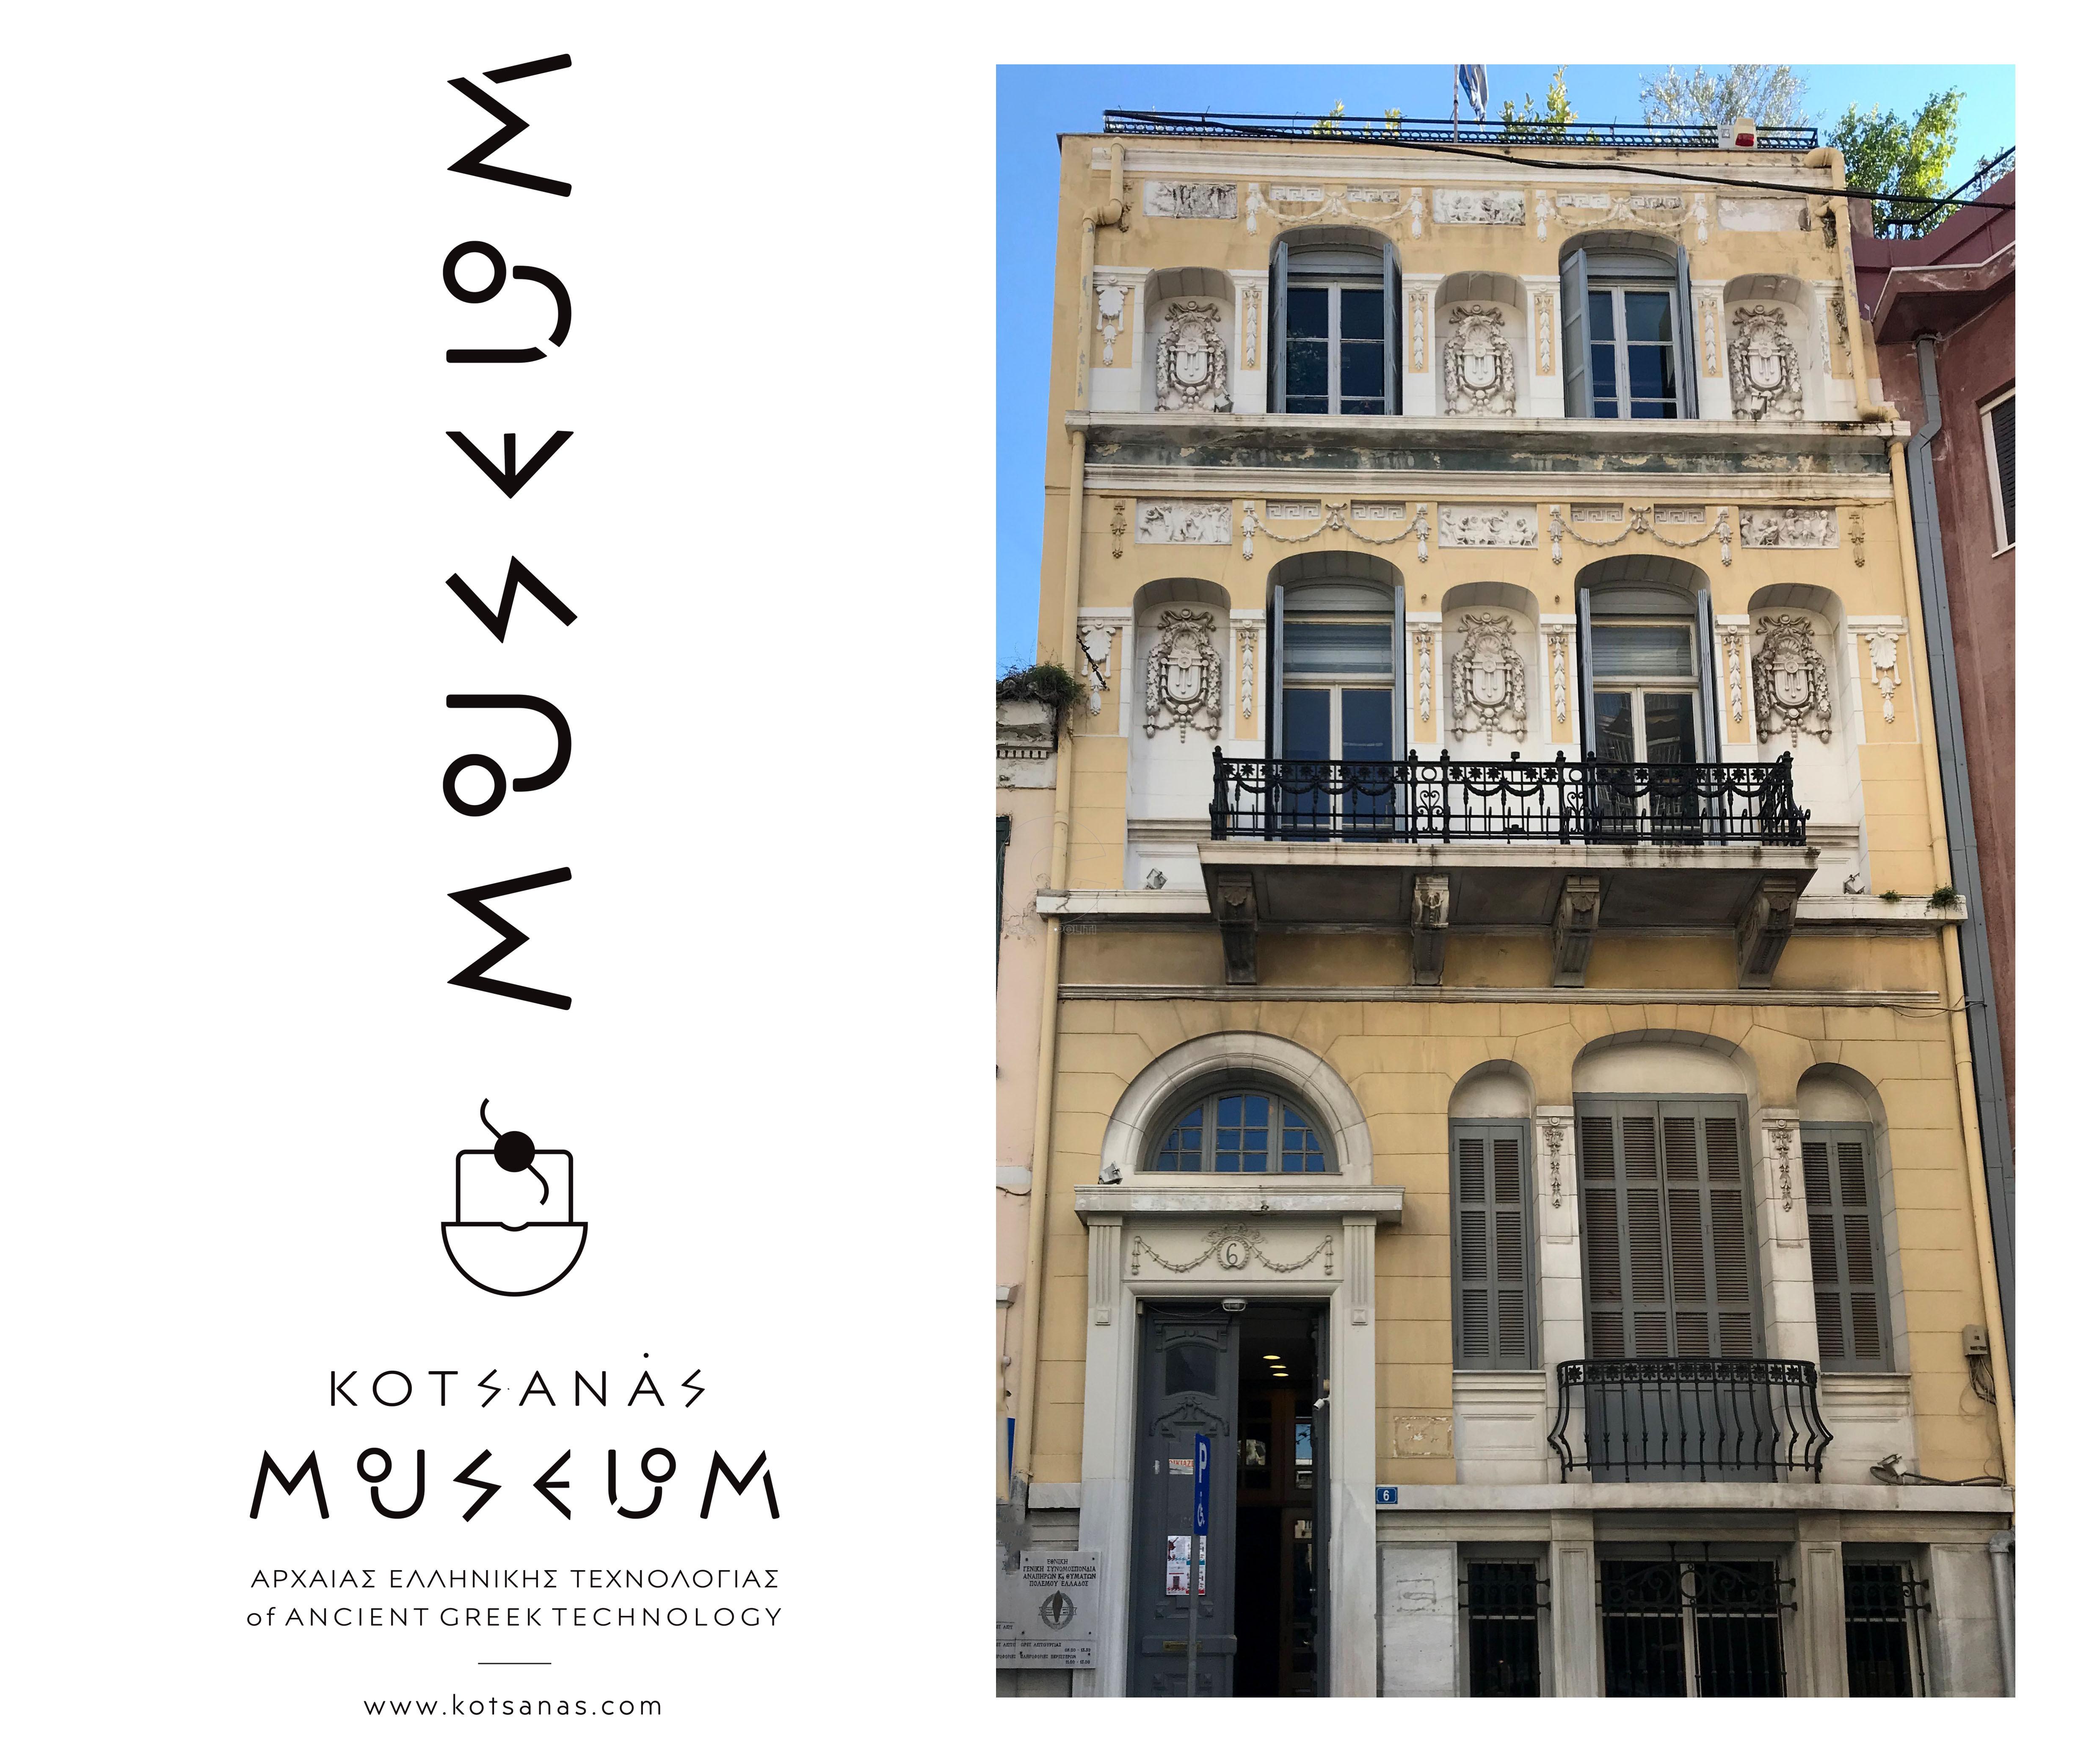 kotsanas_museum